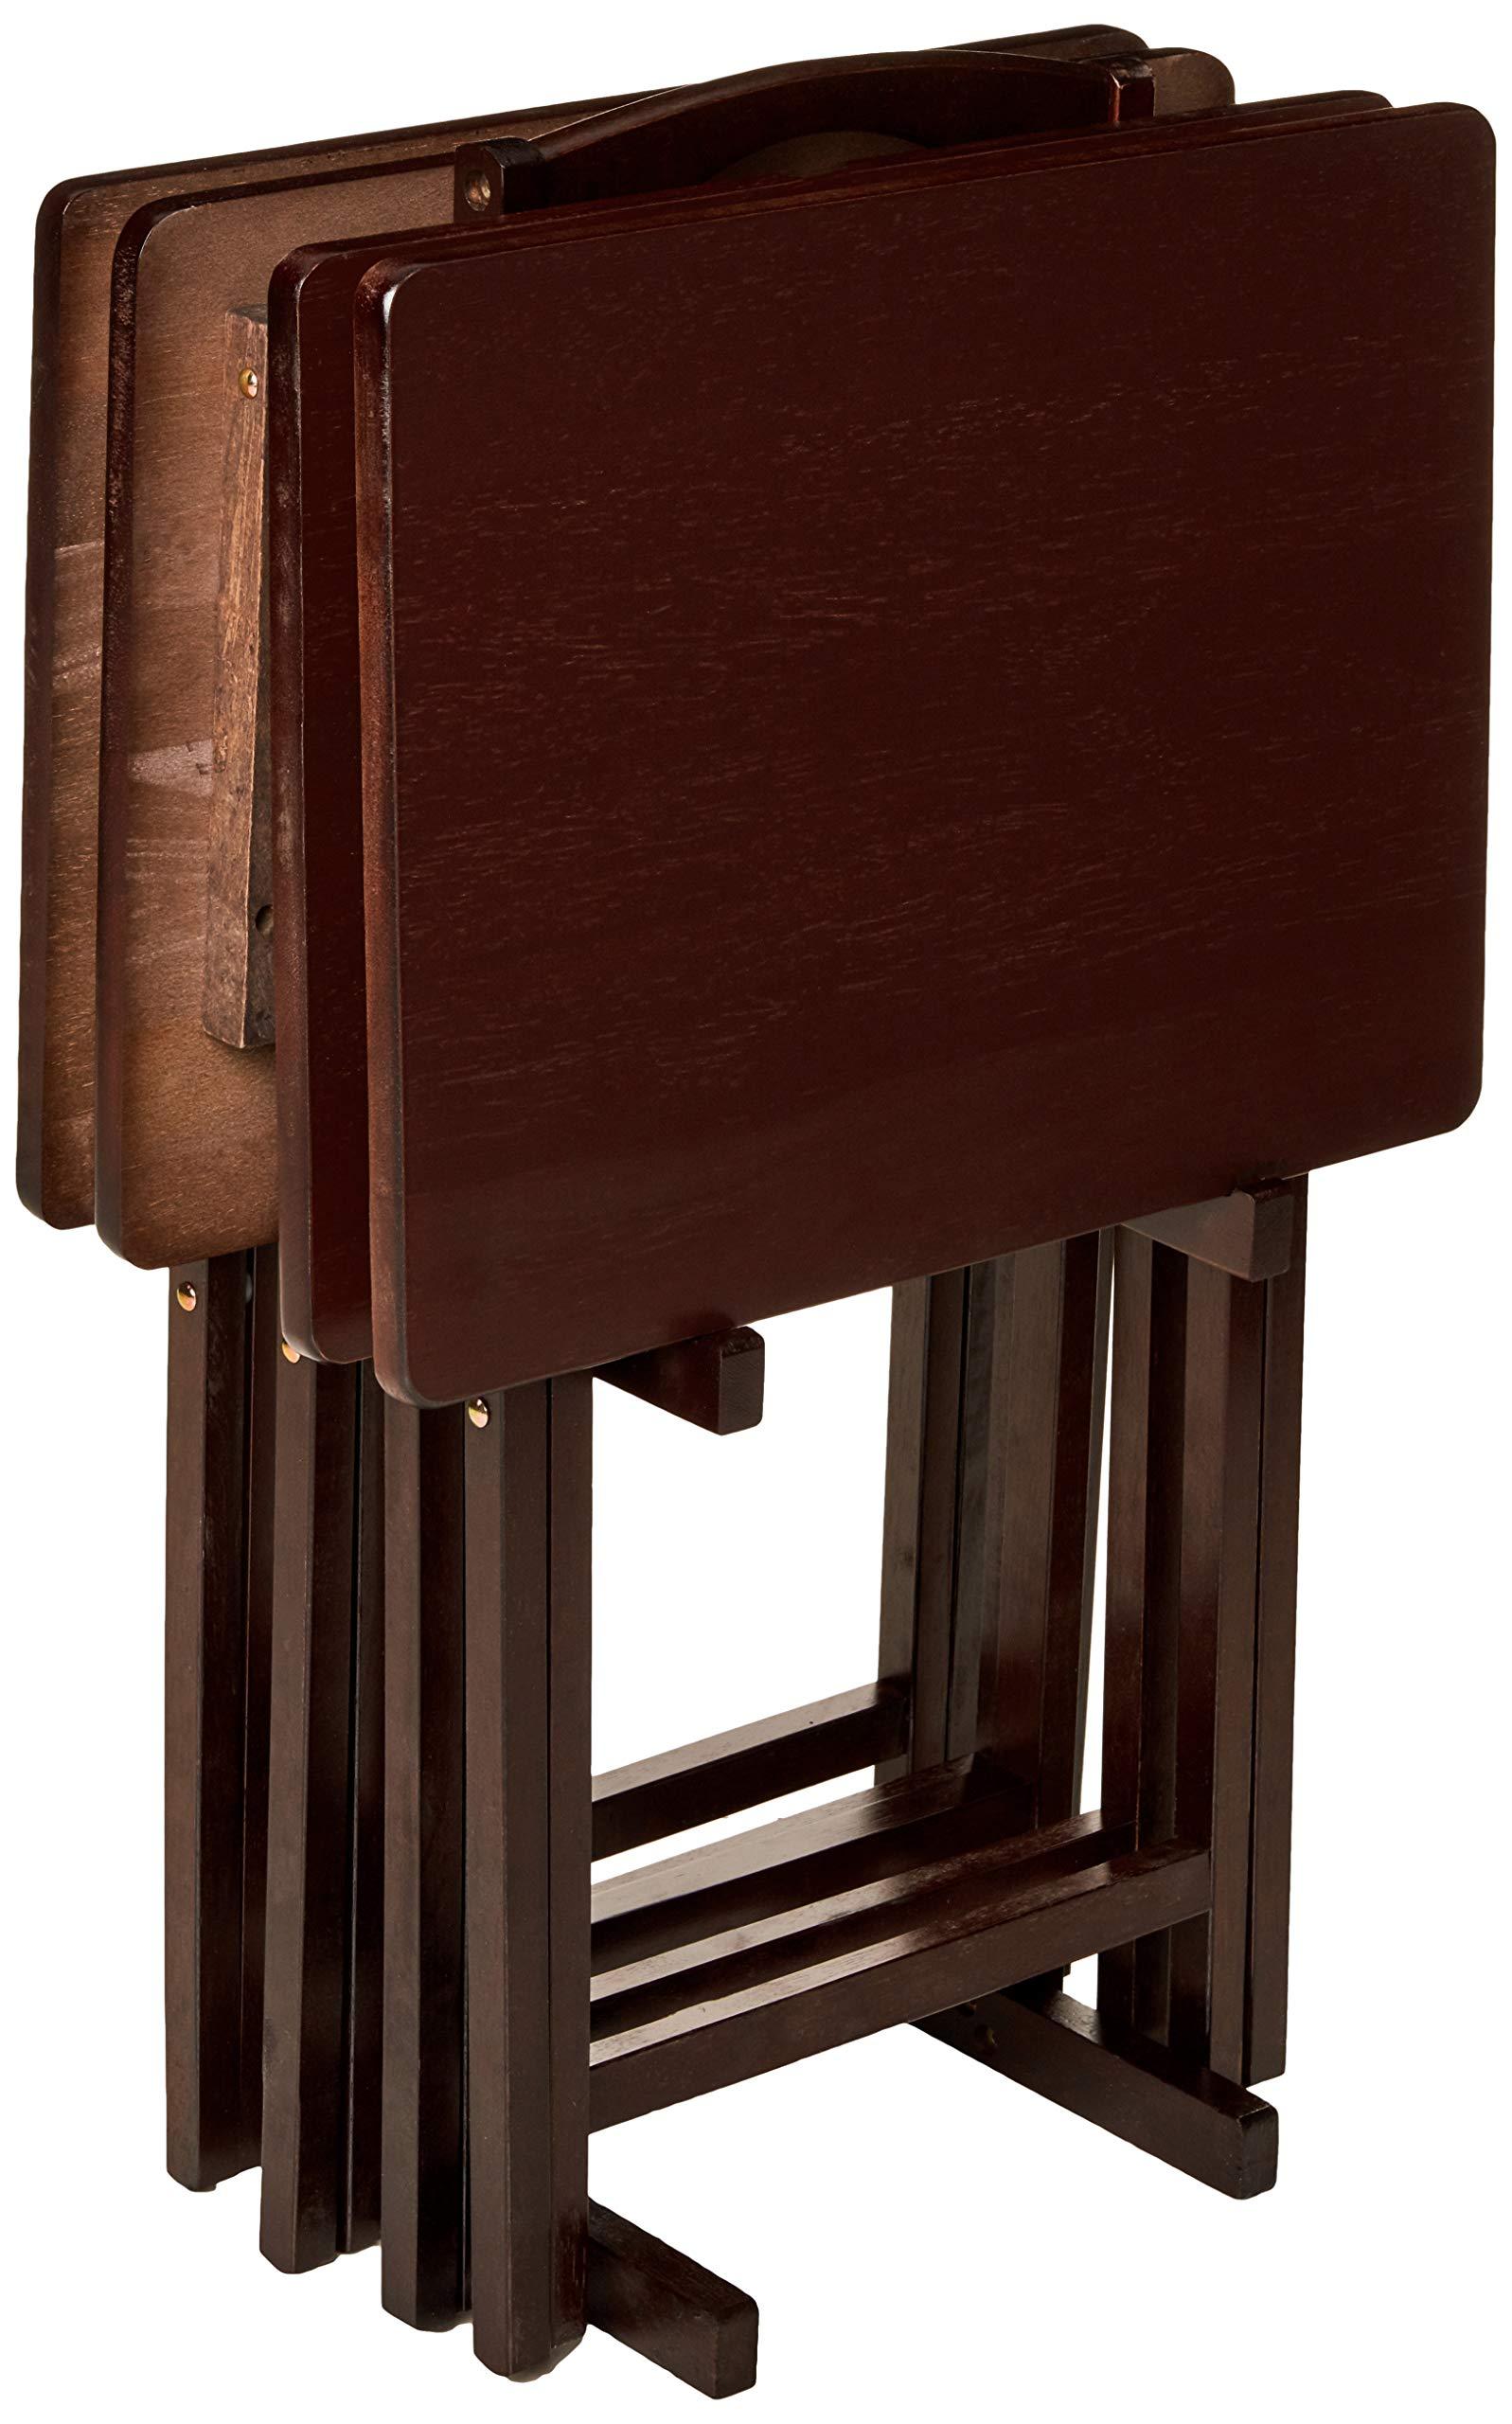 PJ Wood 5-piece Folding TV Tray & Snack Table - Espresso by PJ Wood